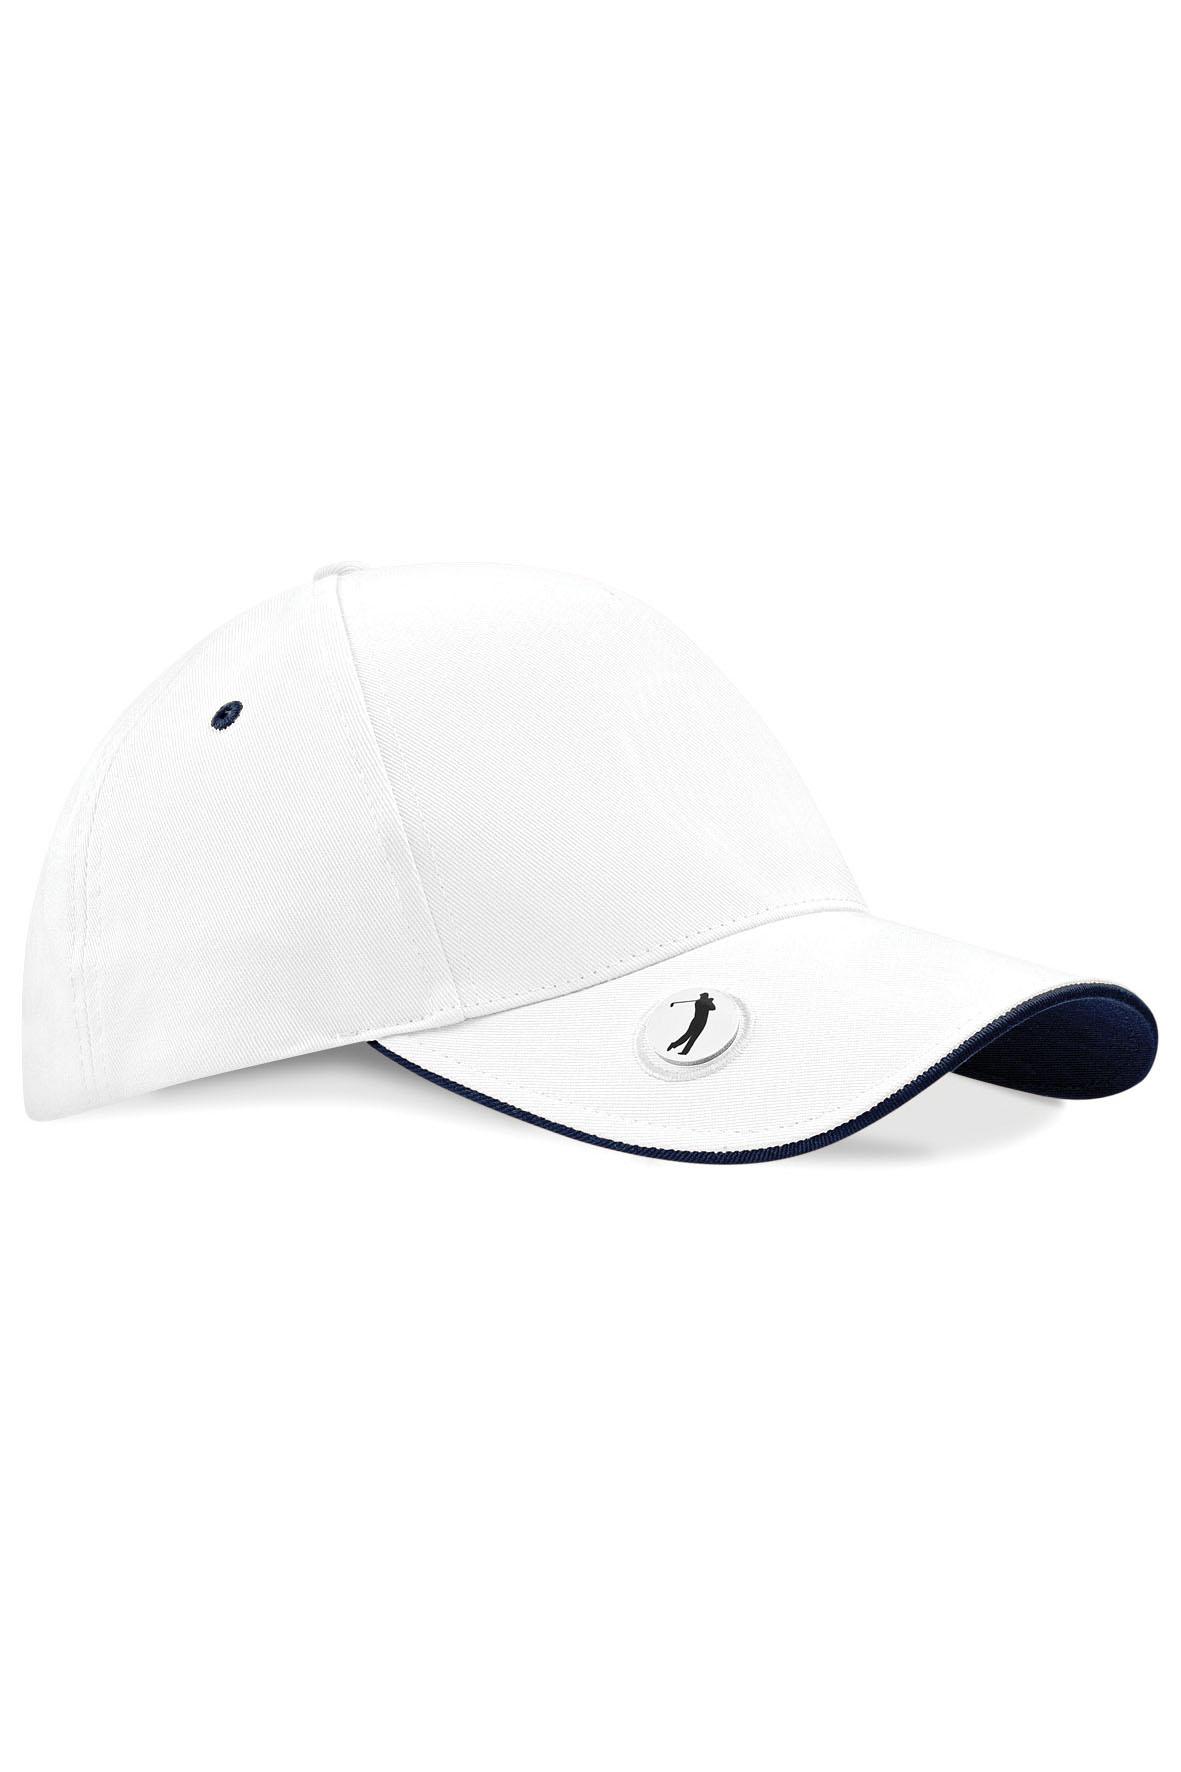 Golflippis Valkoinen-French Navy